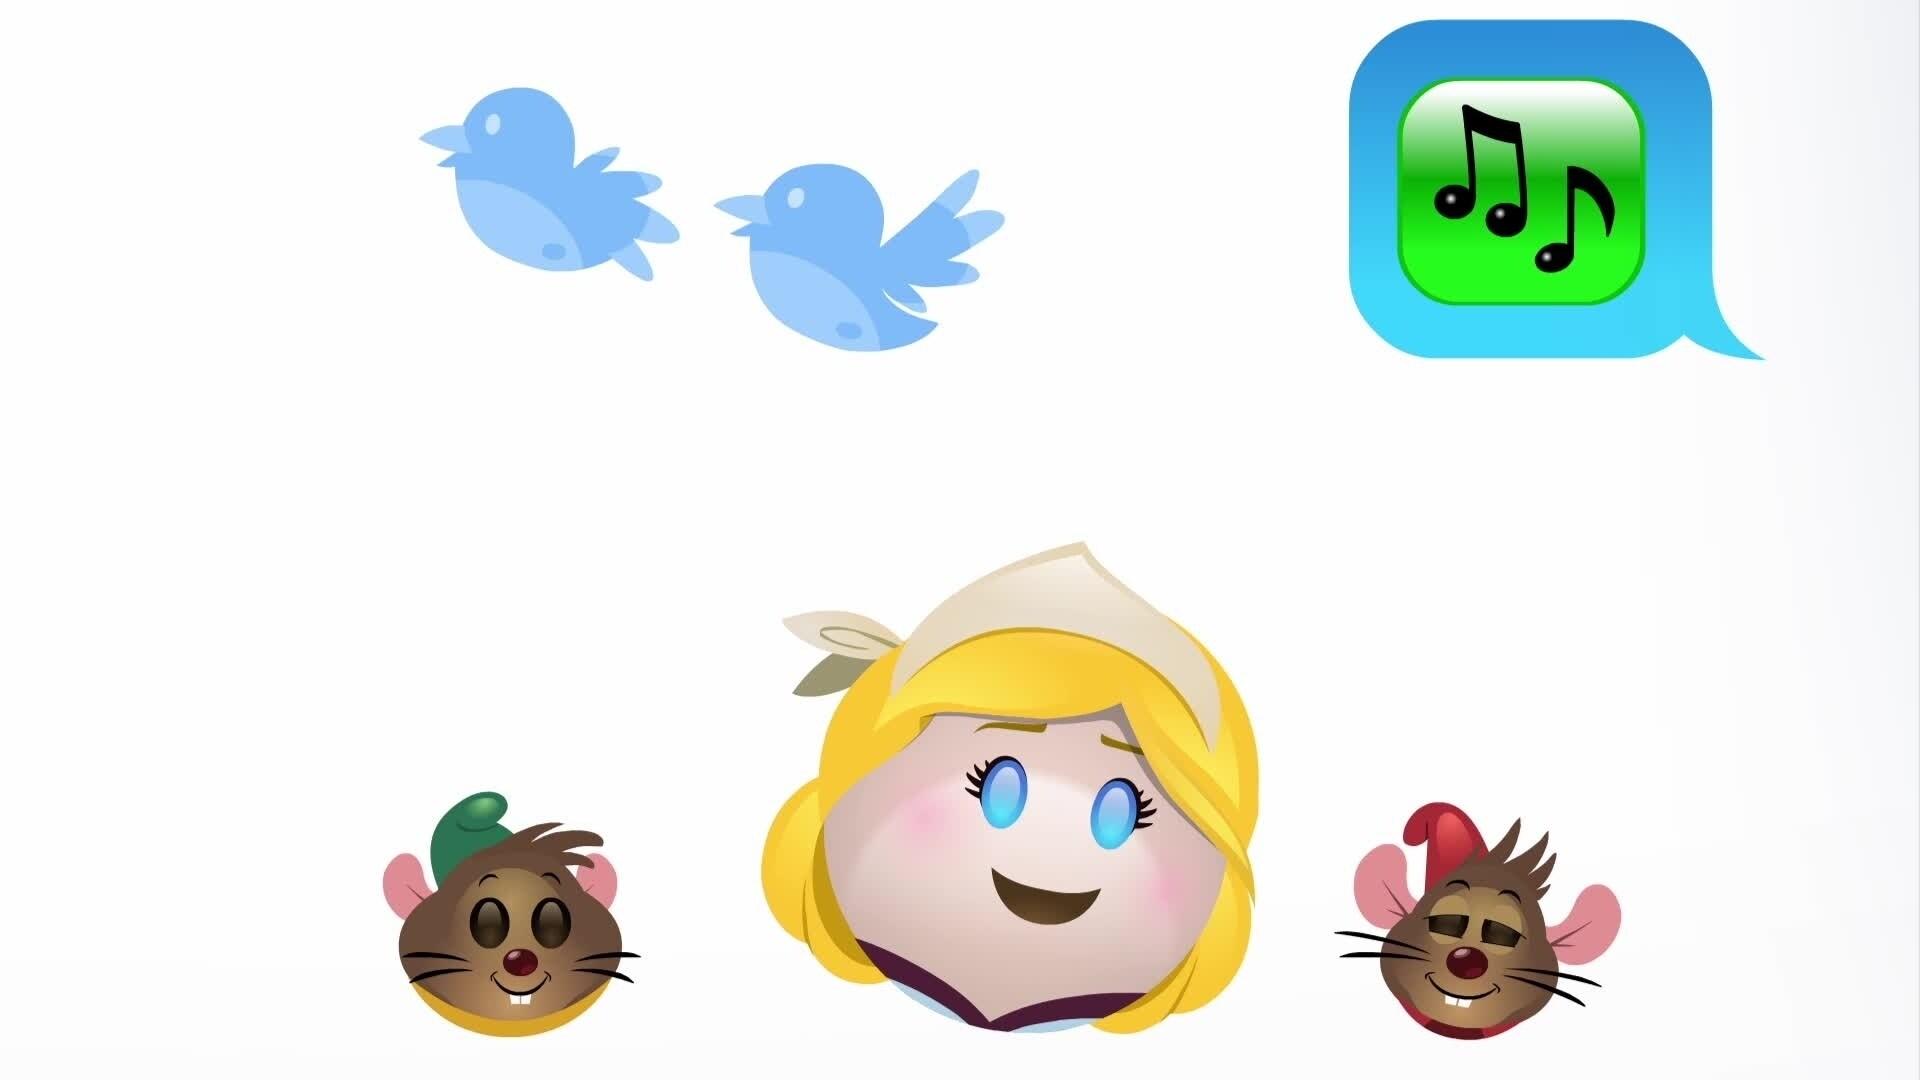 Kopciuszek w wersji emoji